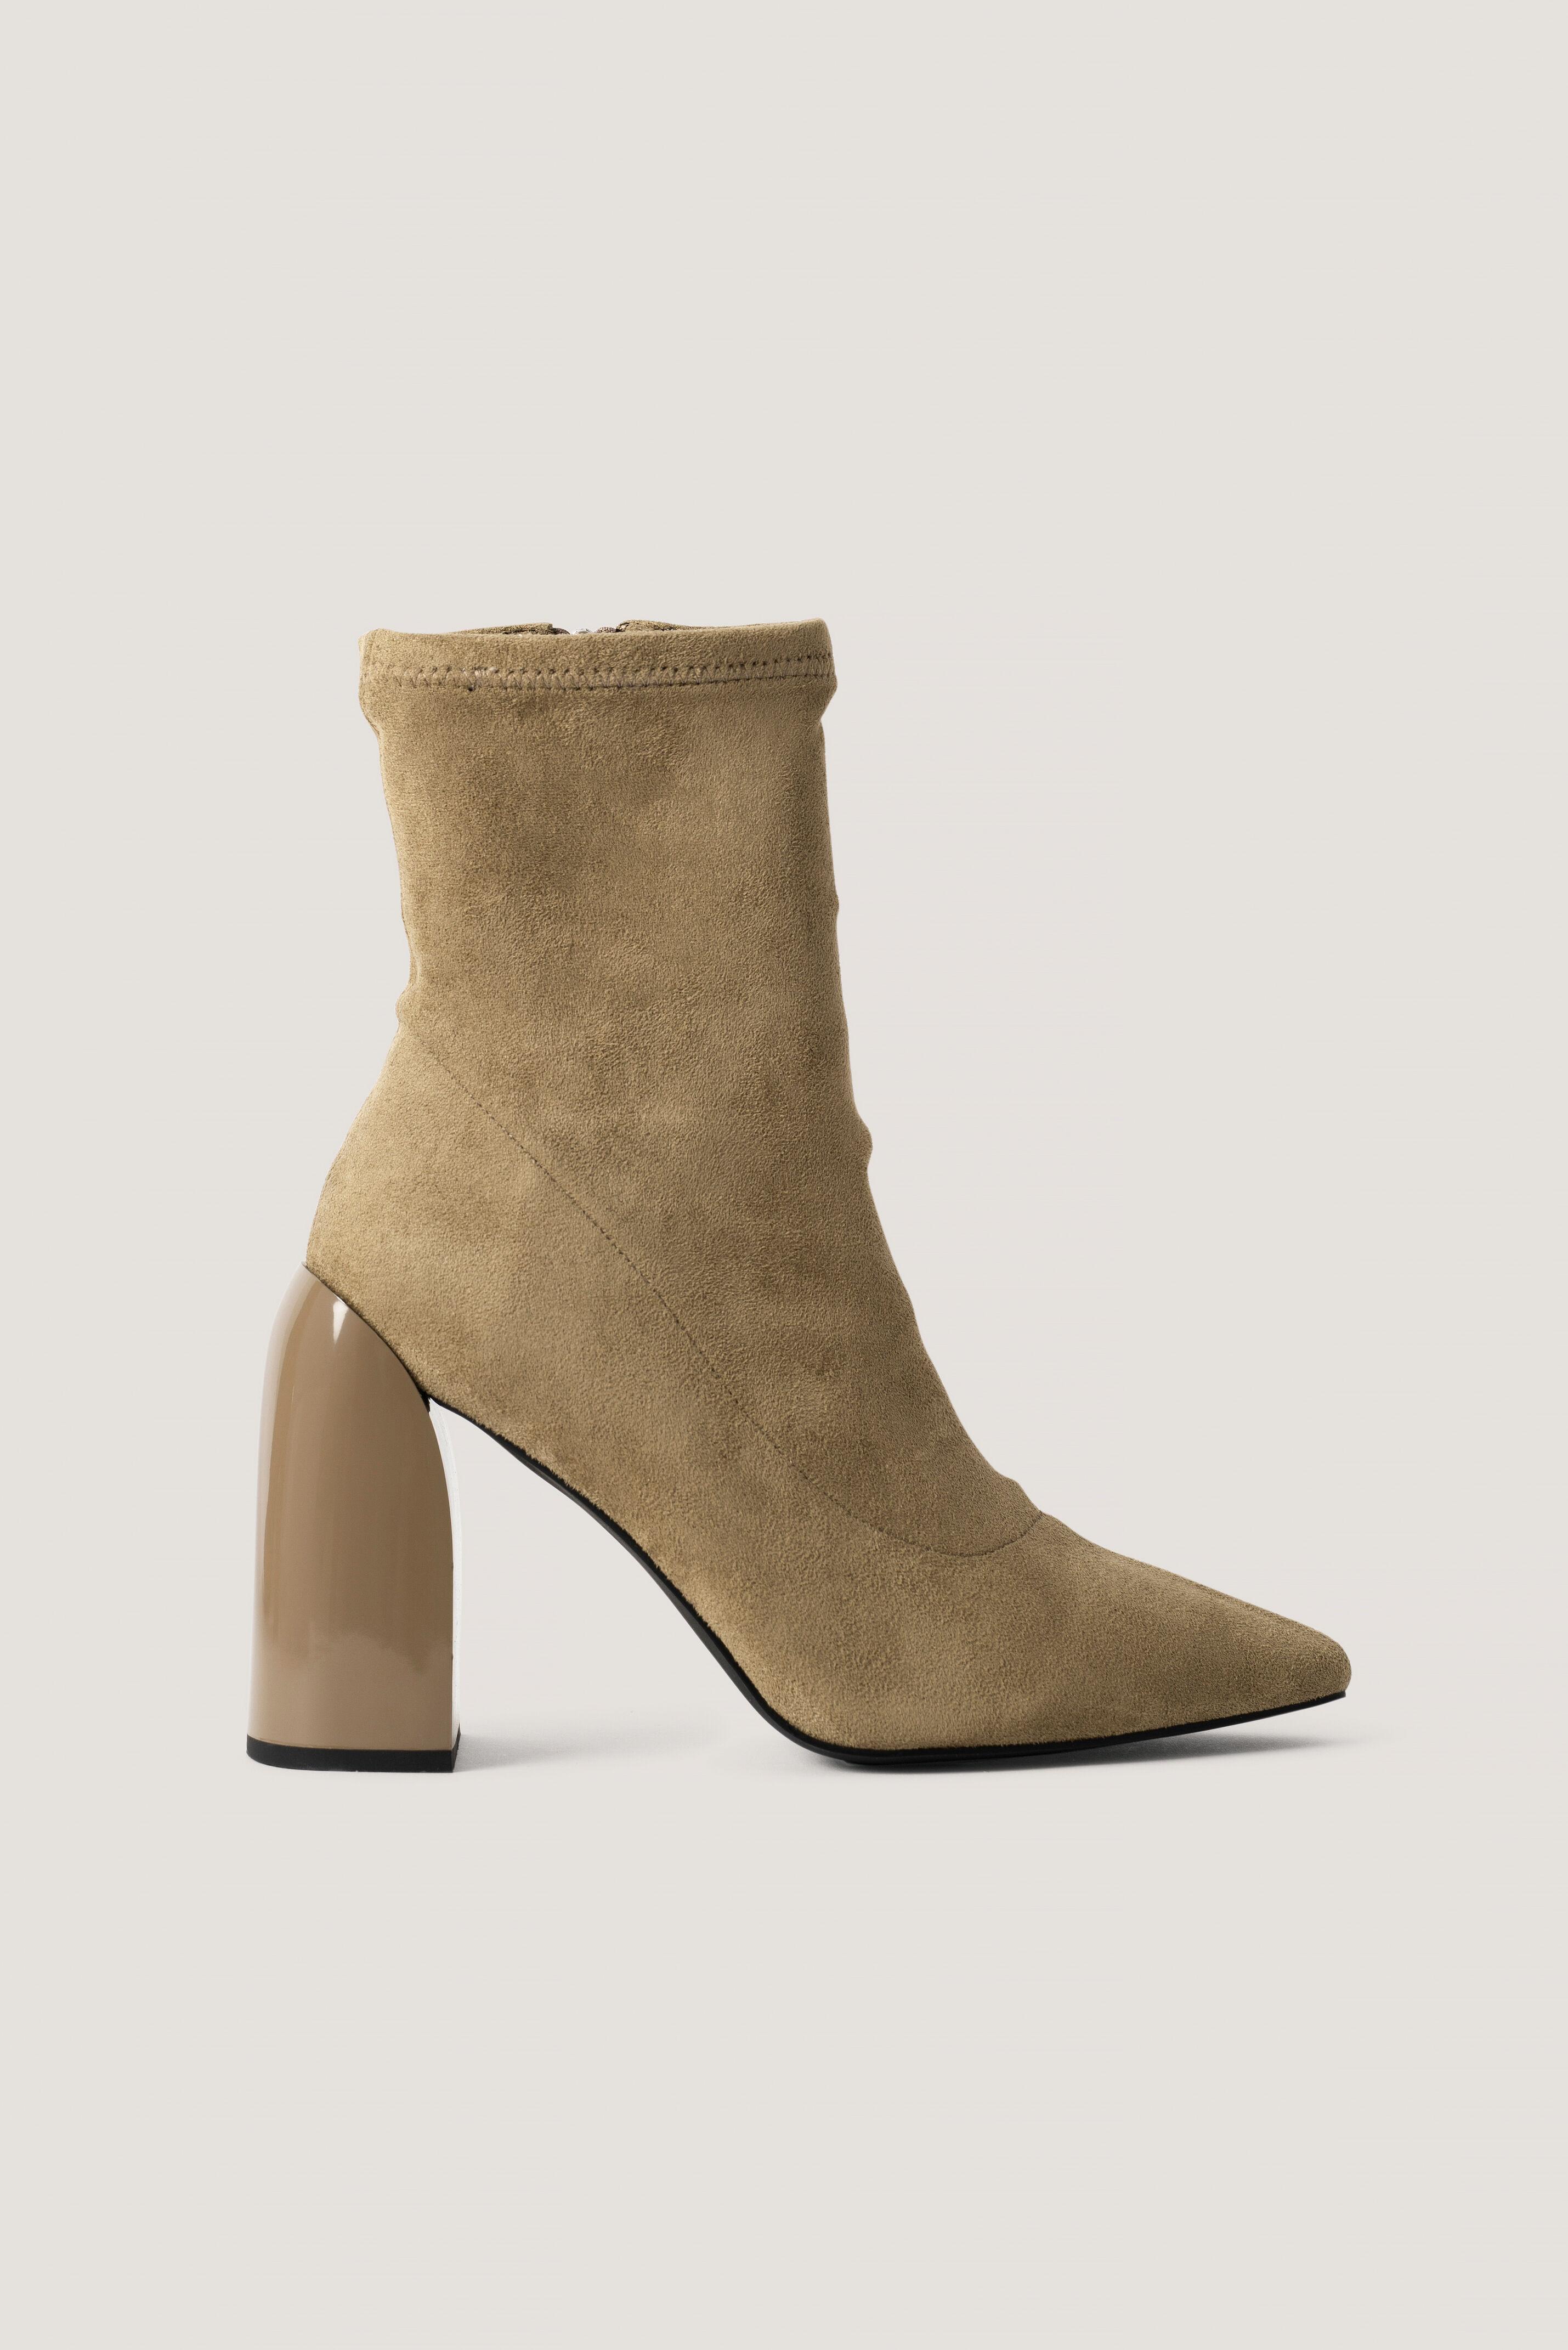 NA-KD Shoes Botte Chaussette - Beige